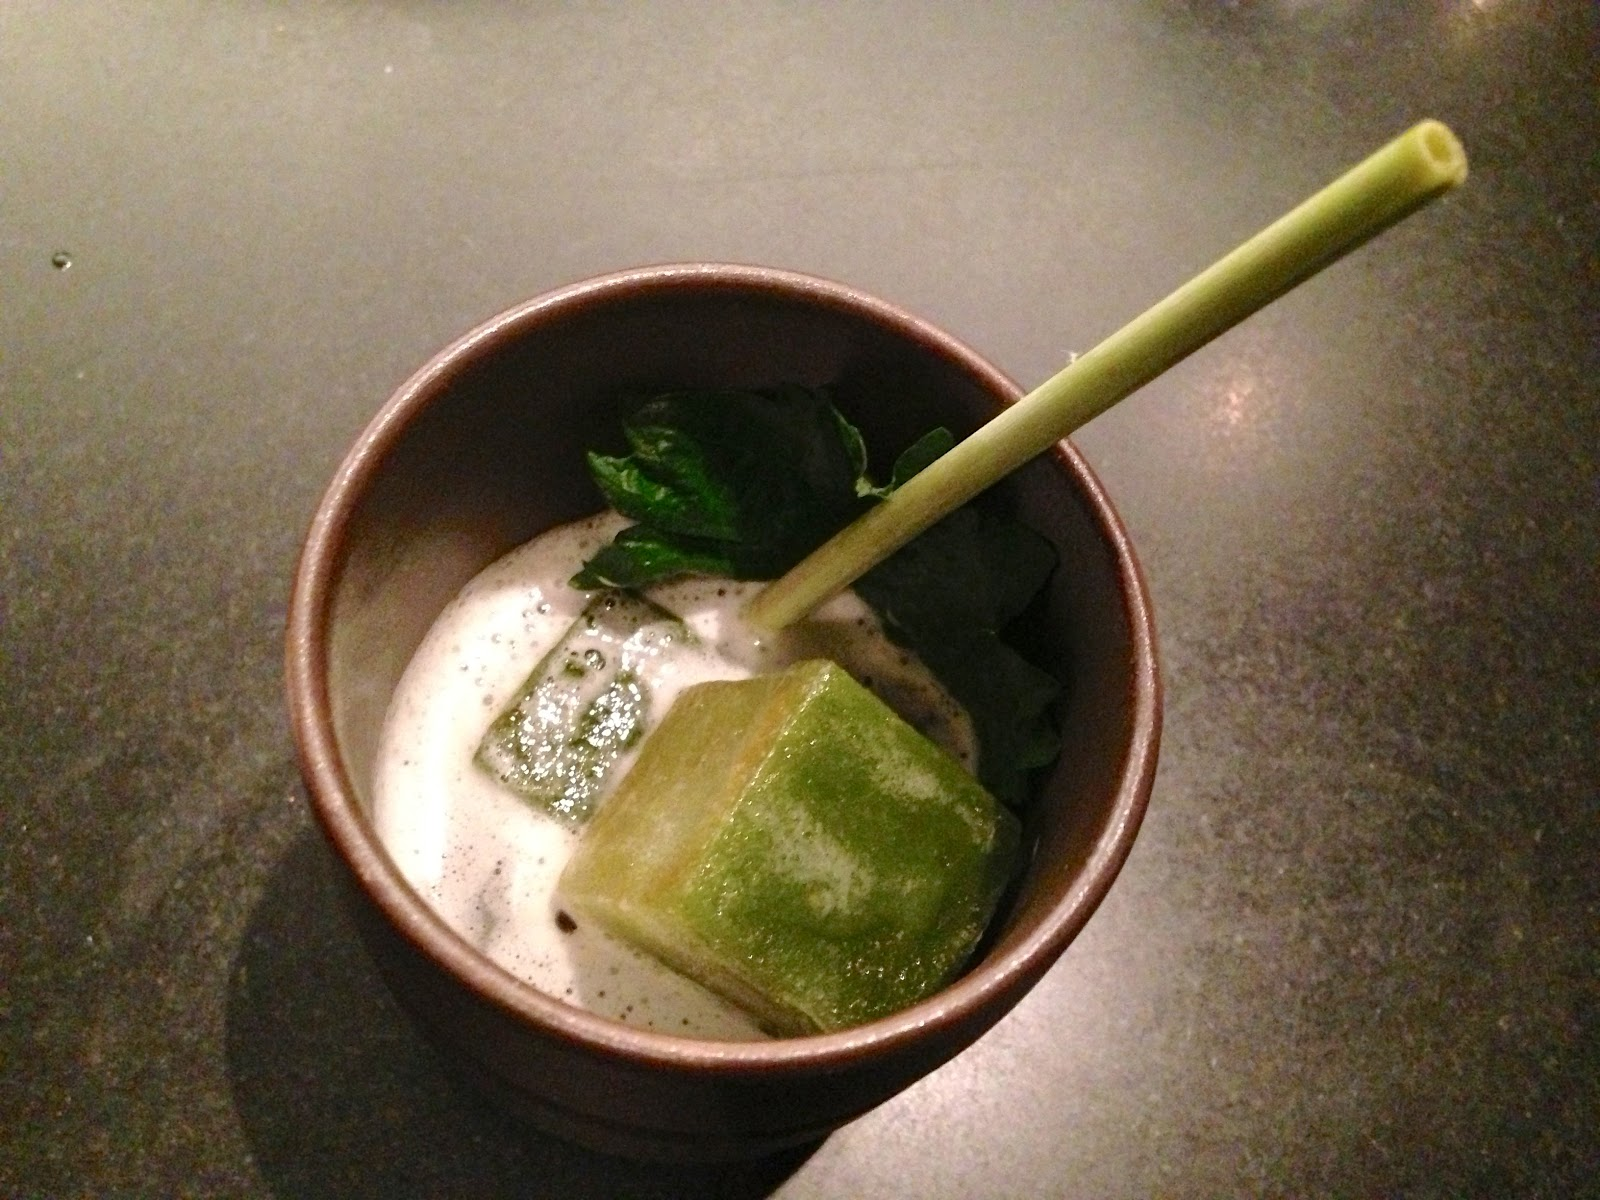 Aviary Kitchen Table Autumn and Kyoto Good Taste is the Worst Vice